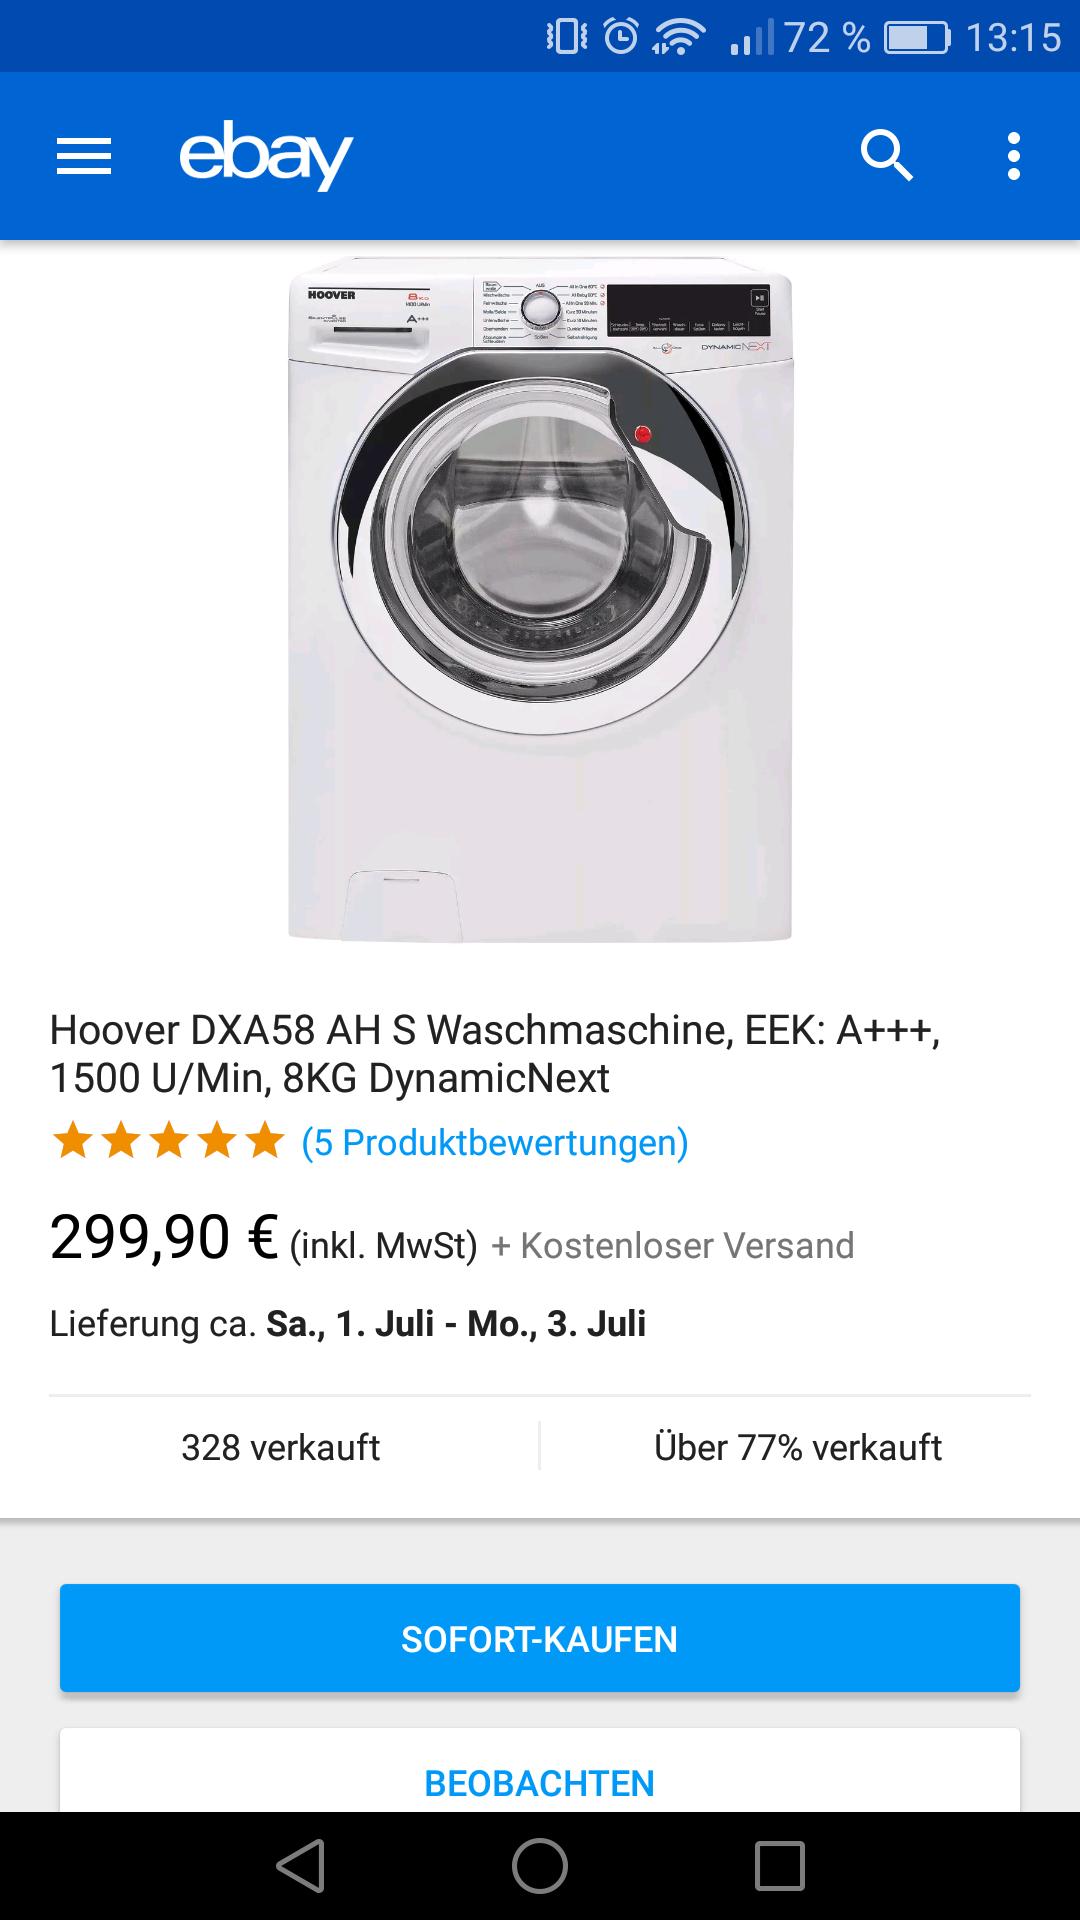 Hoover DXA58 AH- S Waschmaschine, EEK: A+++, 1500 U/Min, 8KG DynamicNext